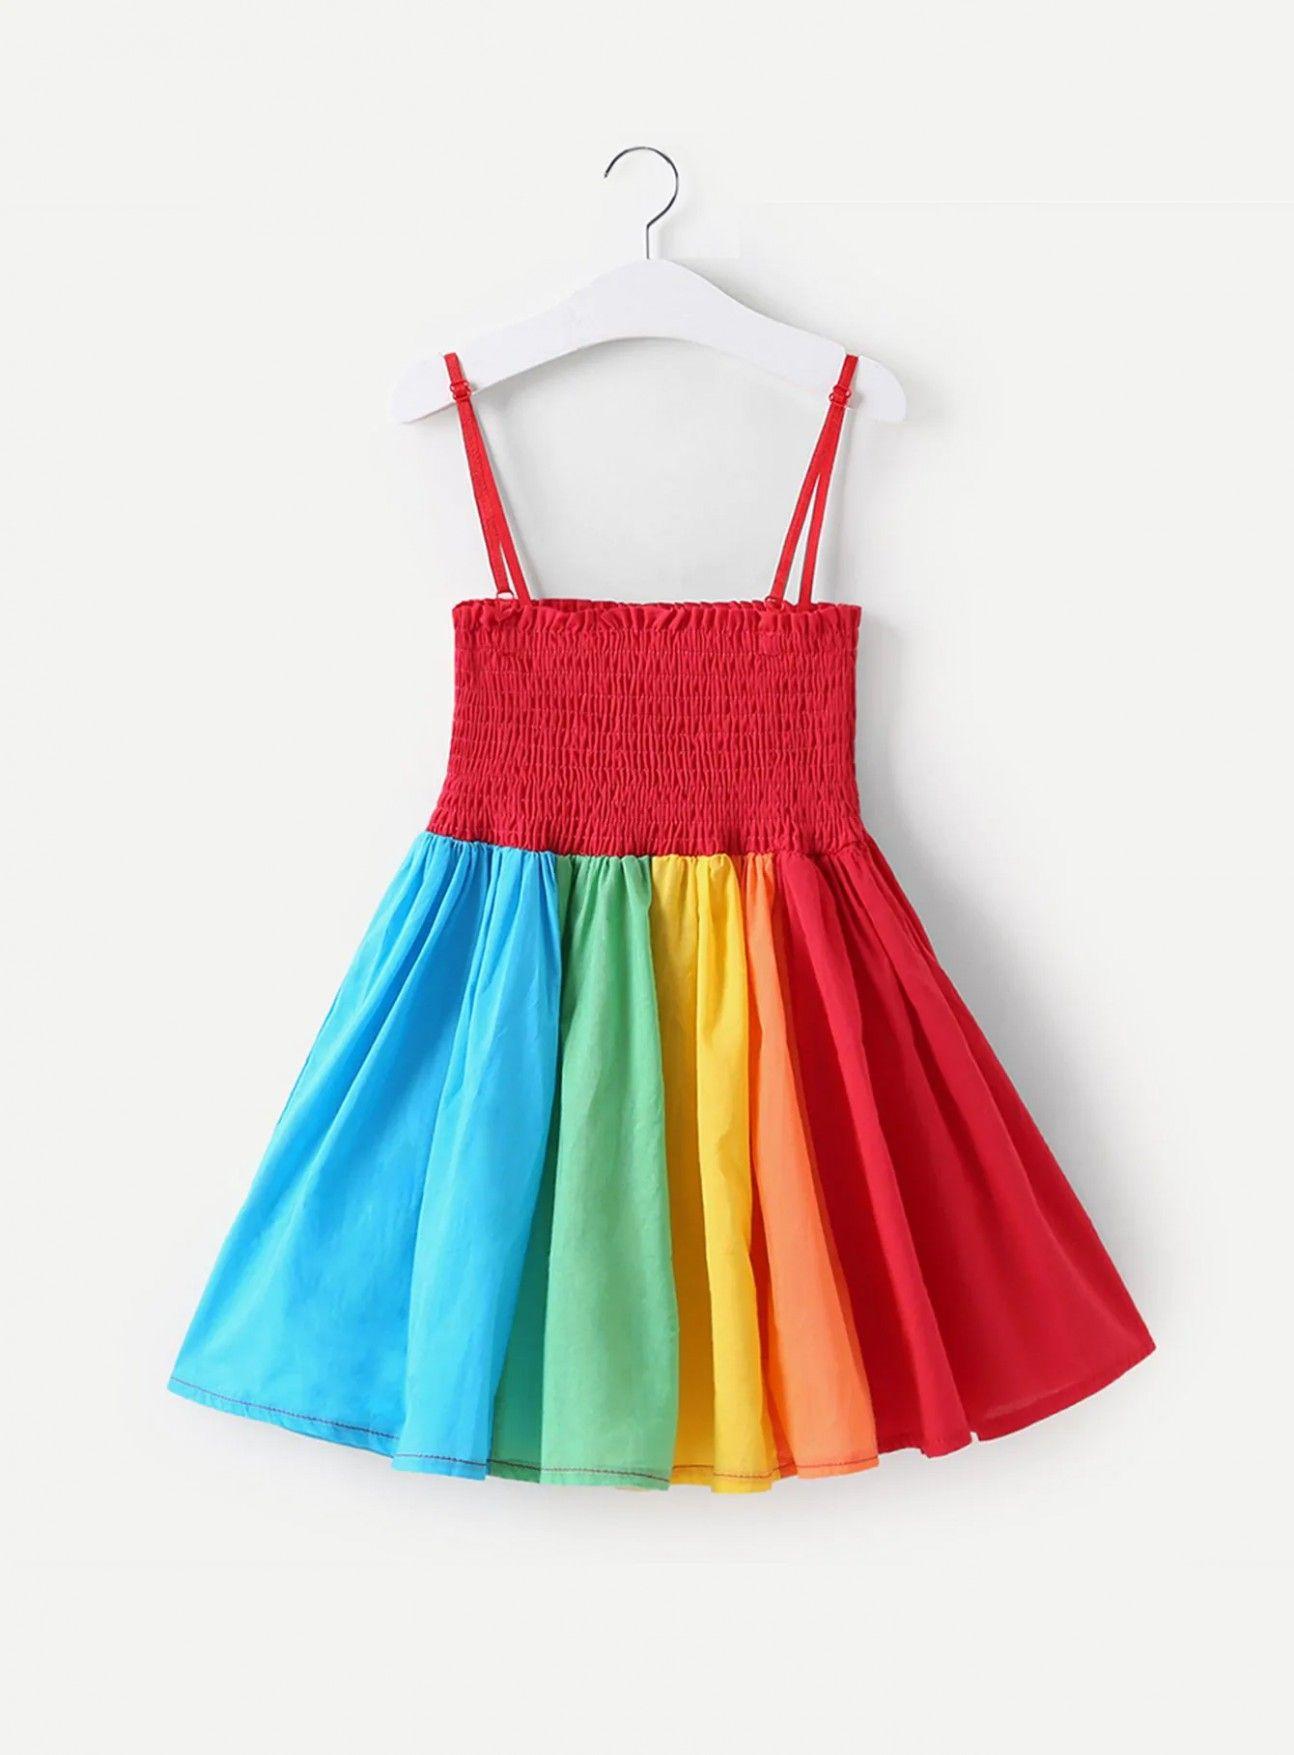 9 Toddler Girls Colourful Striped Cami Dress Toddler Girl Dresses Girls Dresses Summer Toddler Girl Summer [ 1755 x 1294 Pixel ]